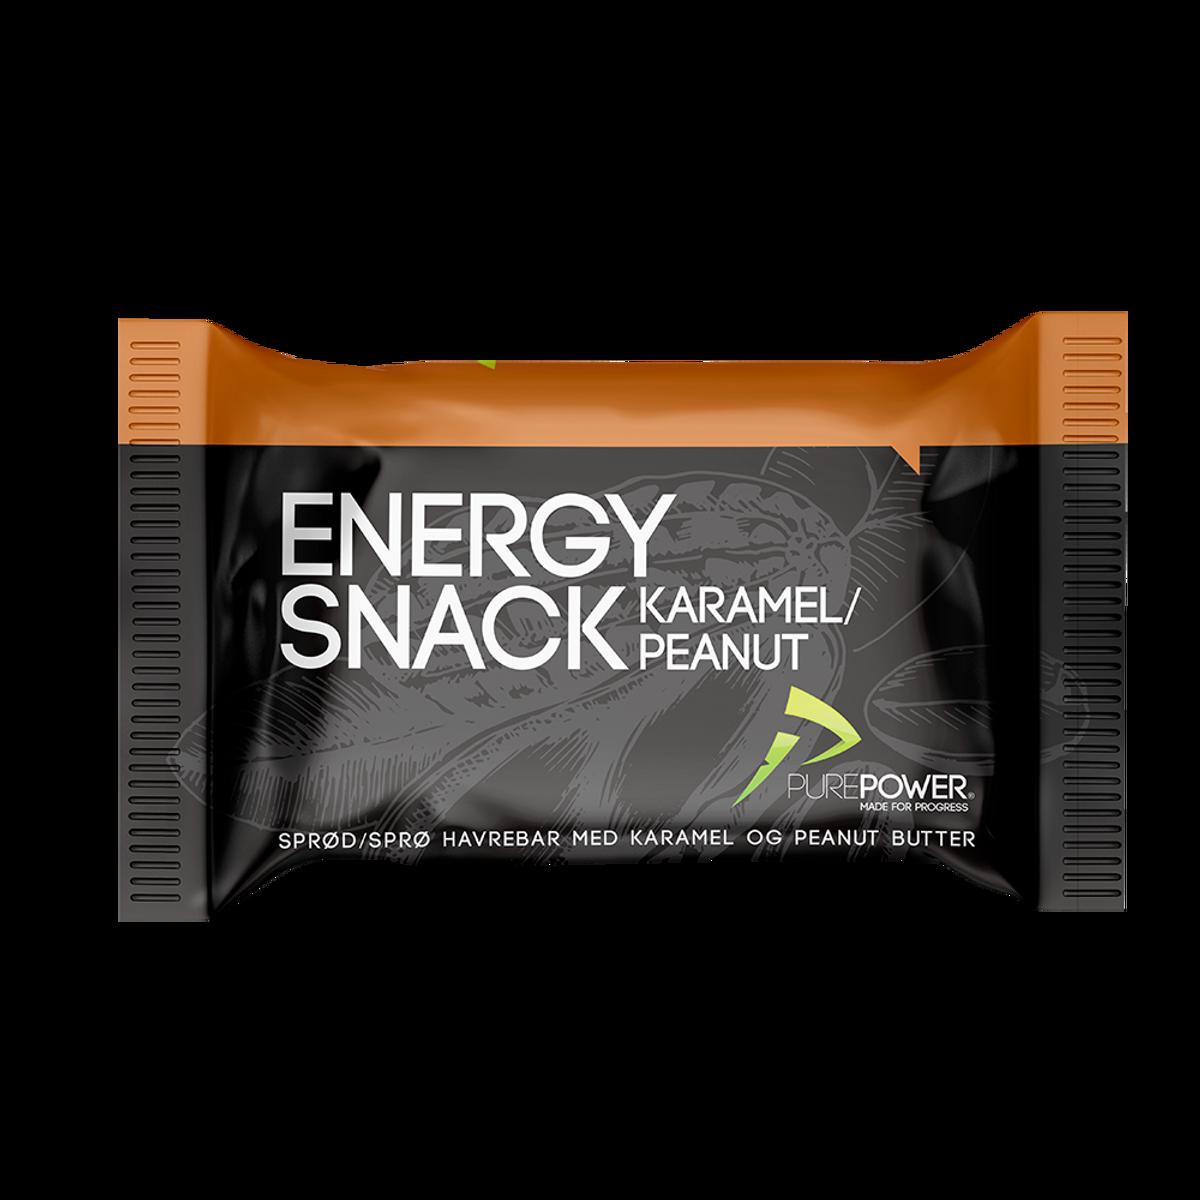 PurePower Energy Snack Caramel & Peanut Bar